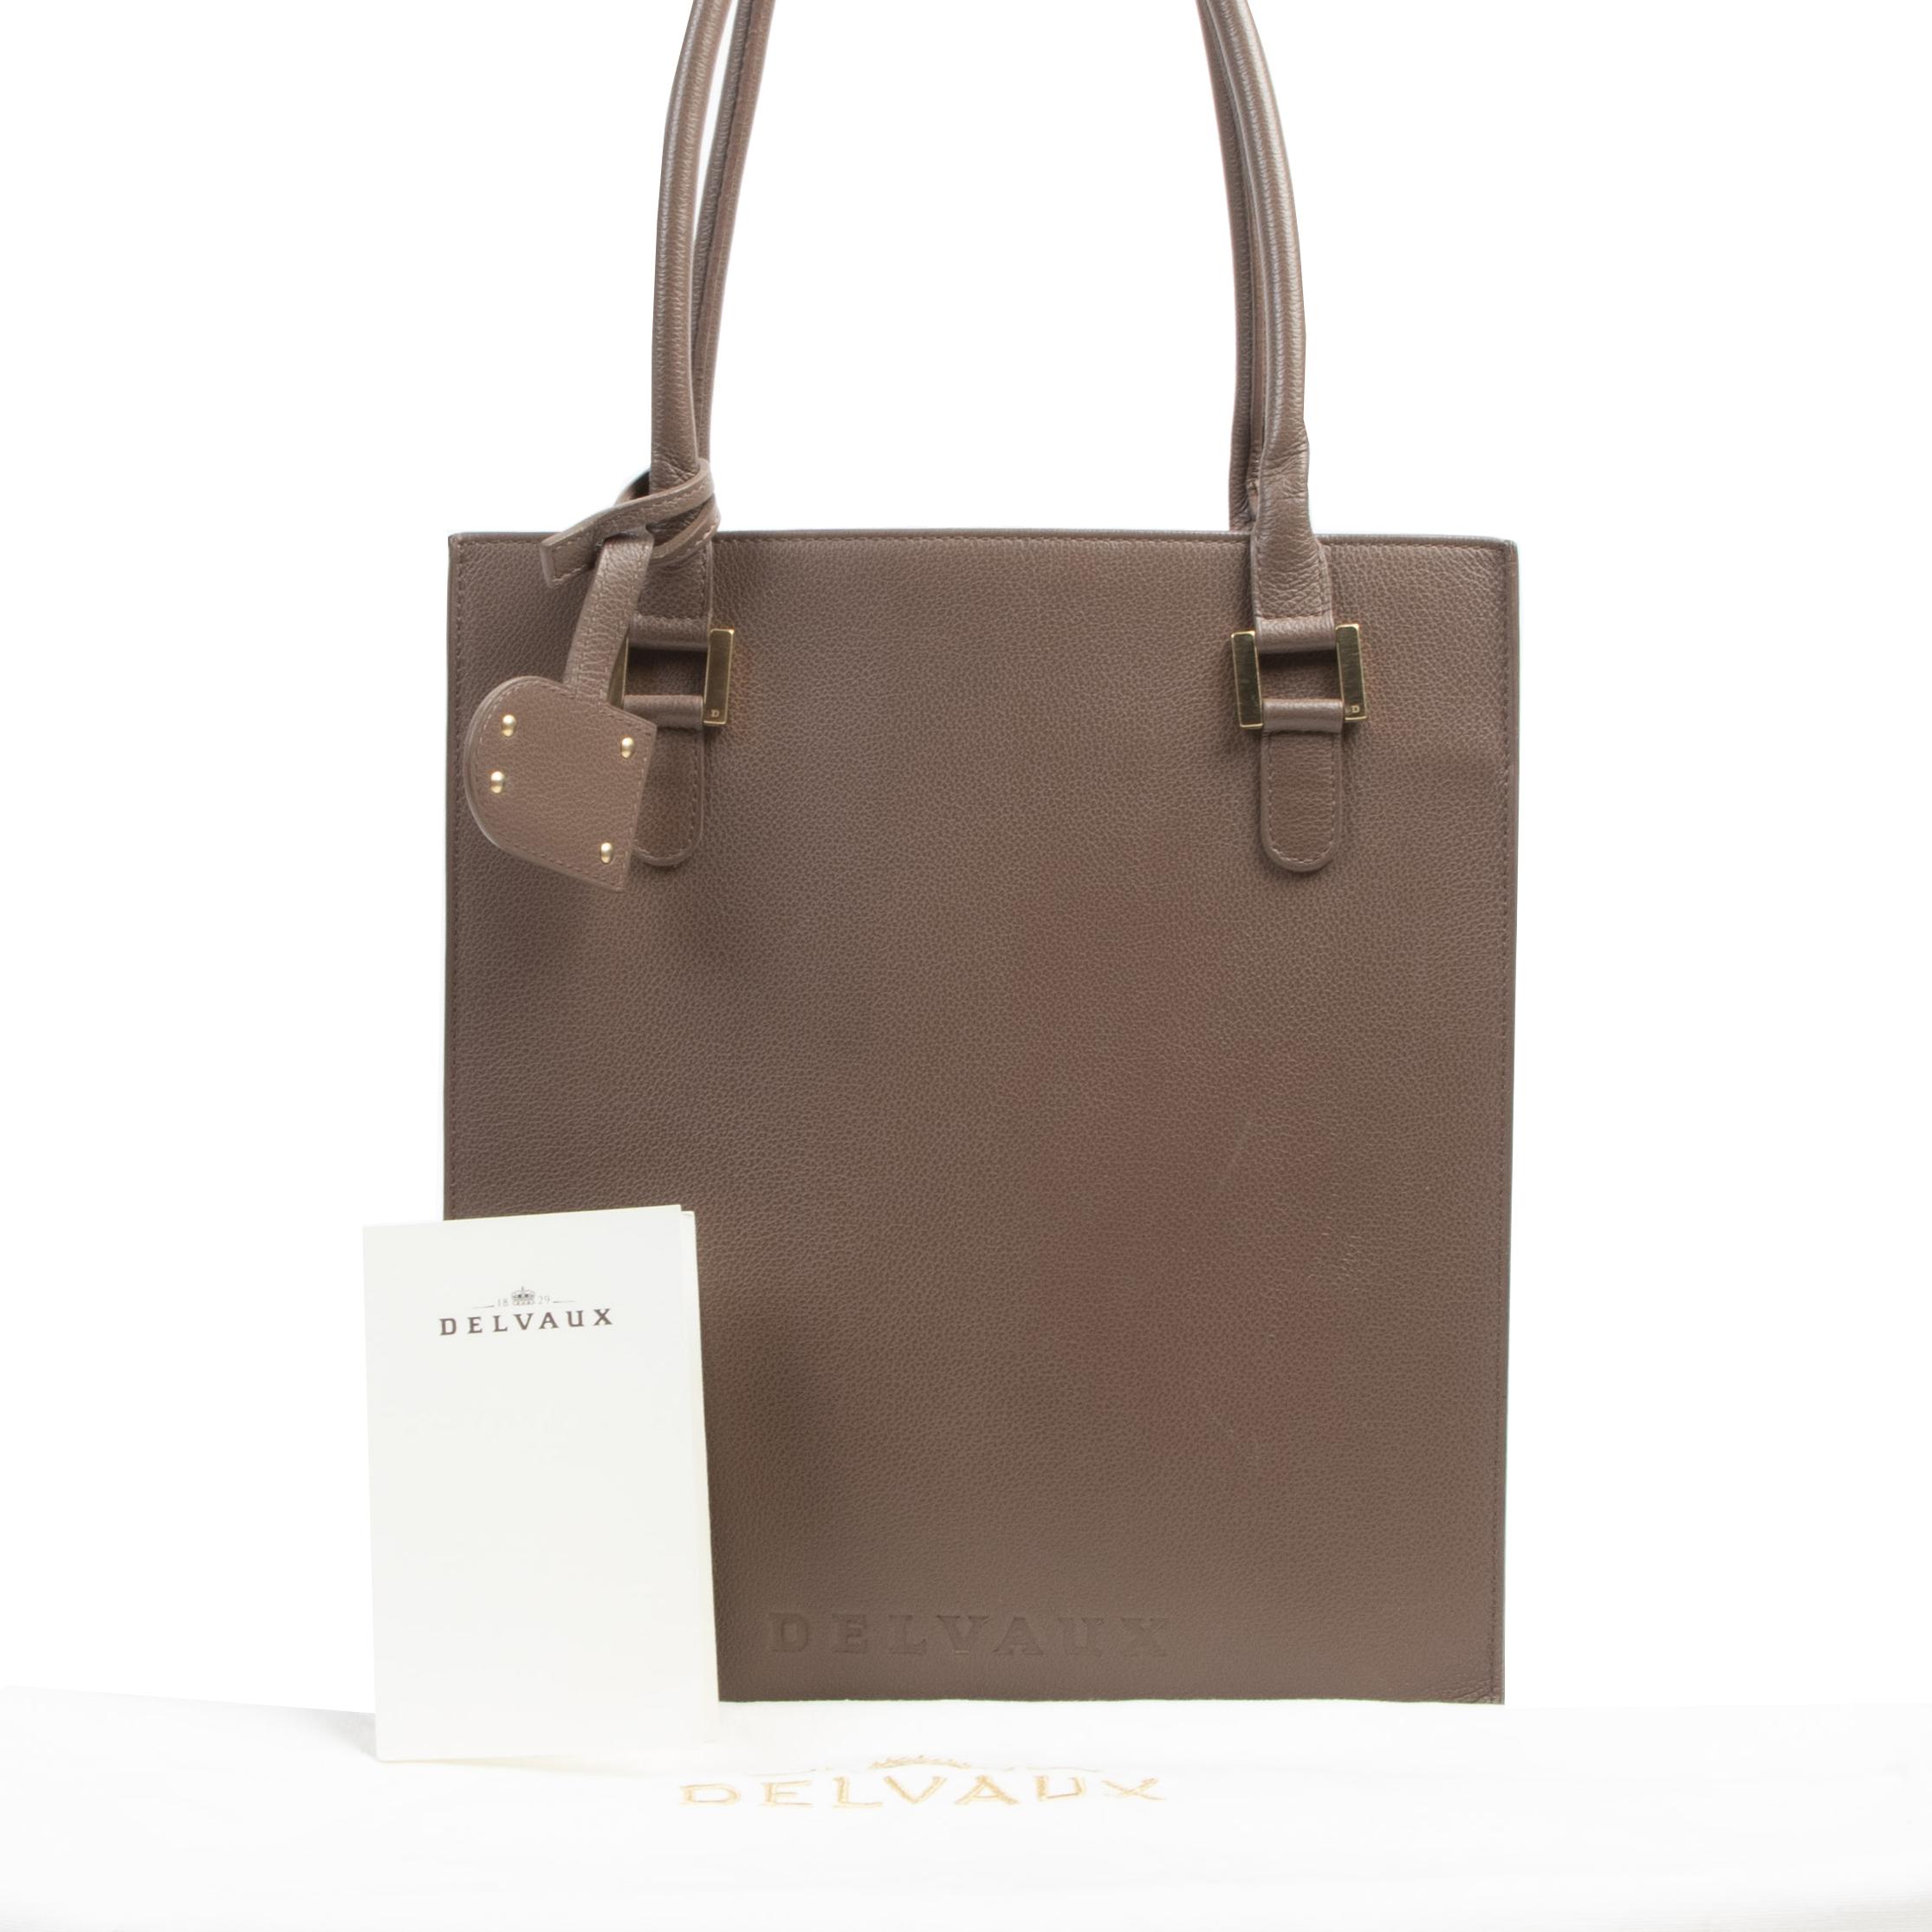 Authentieke tweedehands vintage Delvaux Taupe Le Jeff Tote Bag koop online webshop LabelLOV